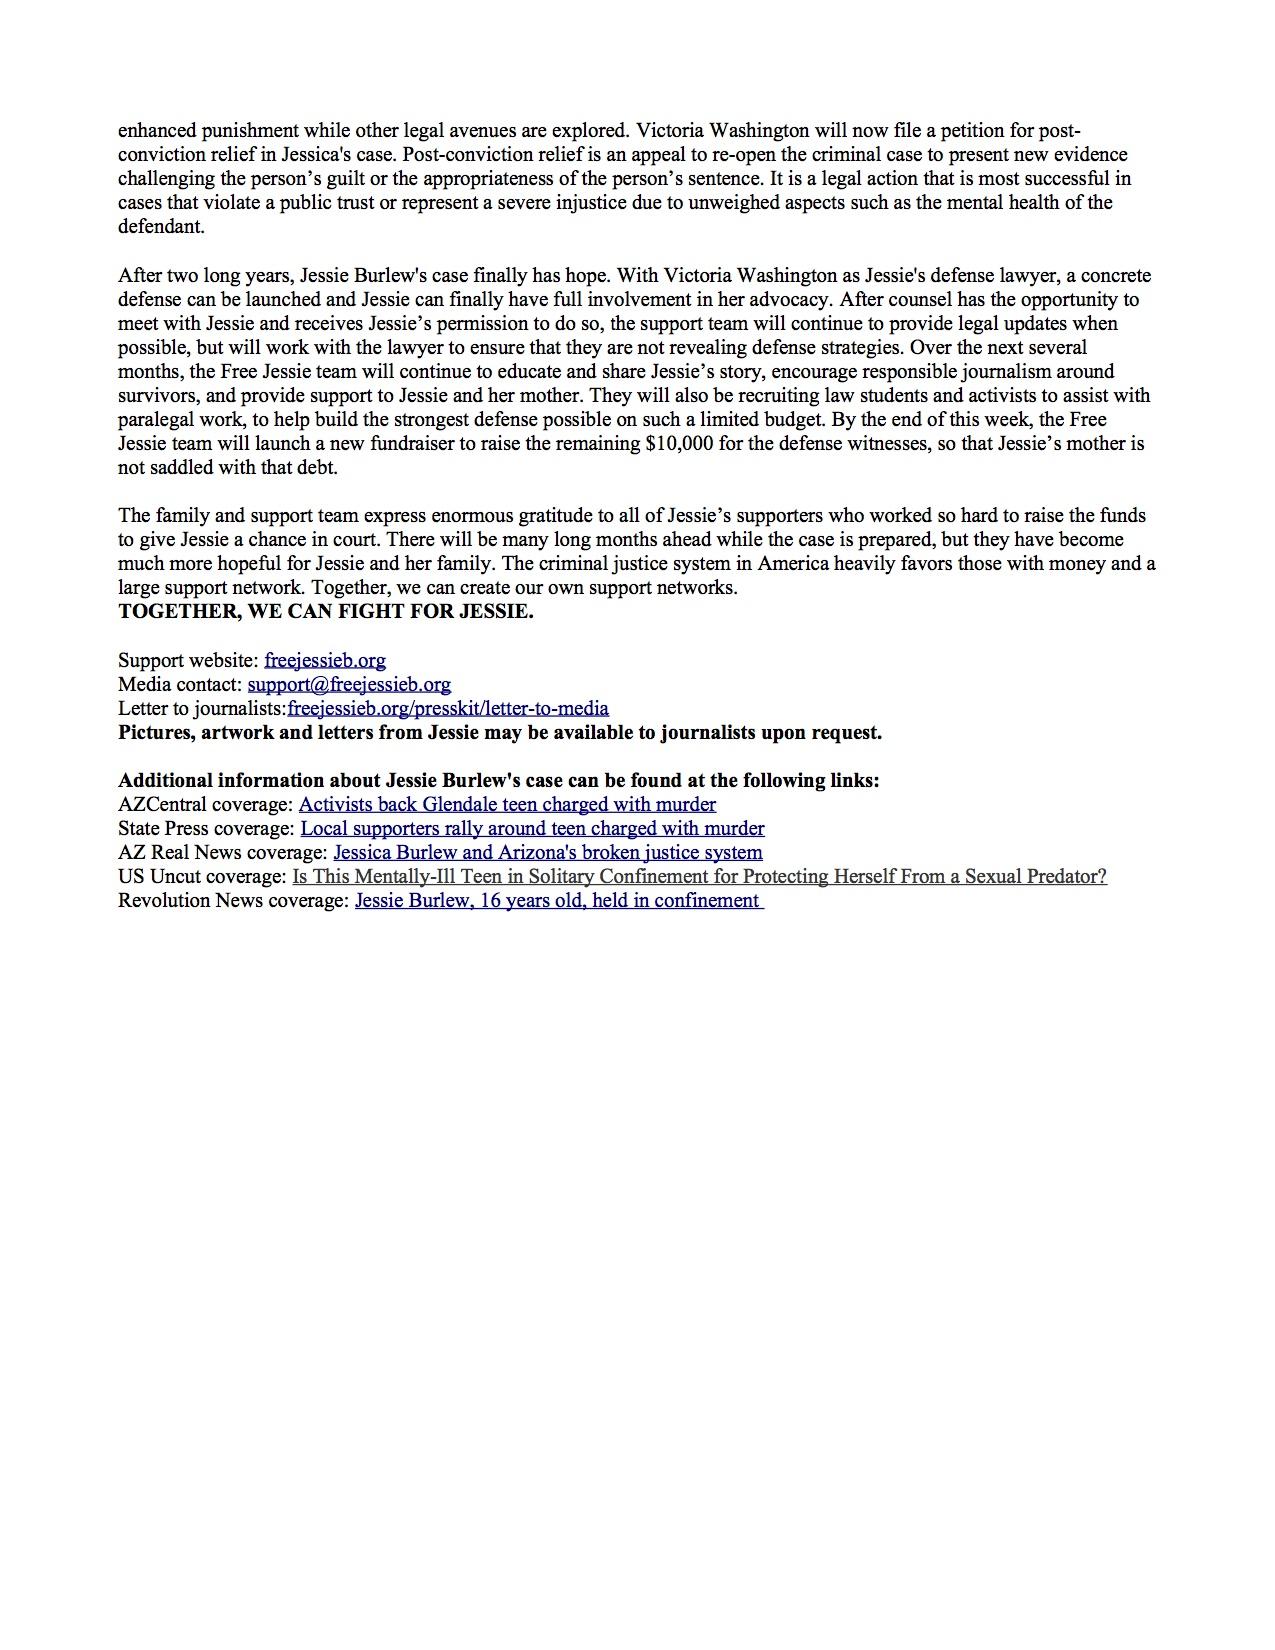 Jessie Burlew sentencing press release2